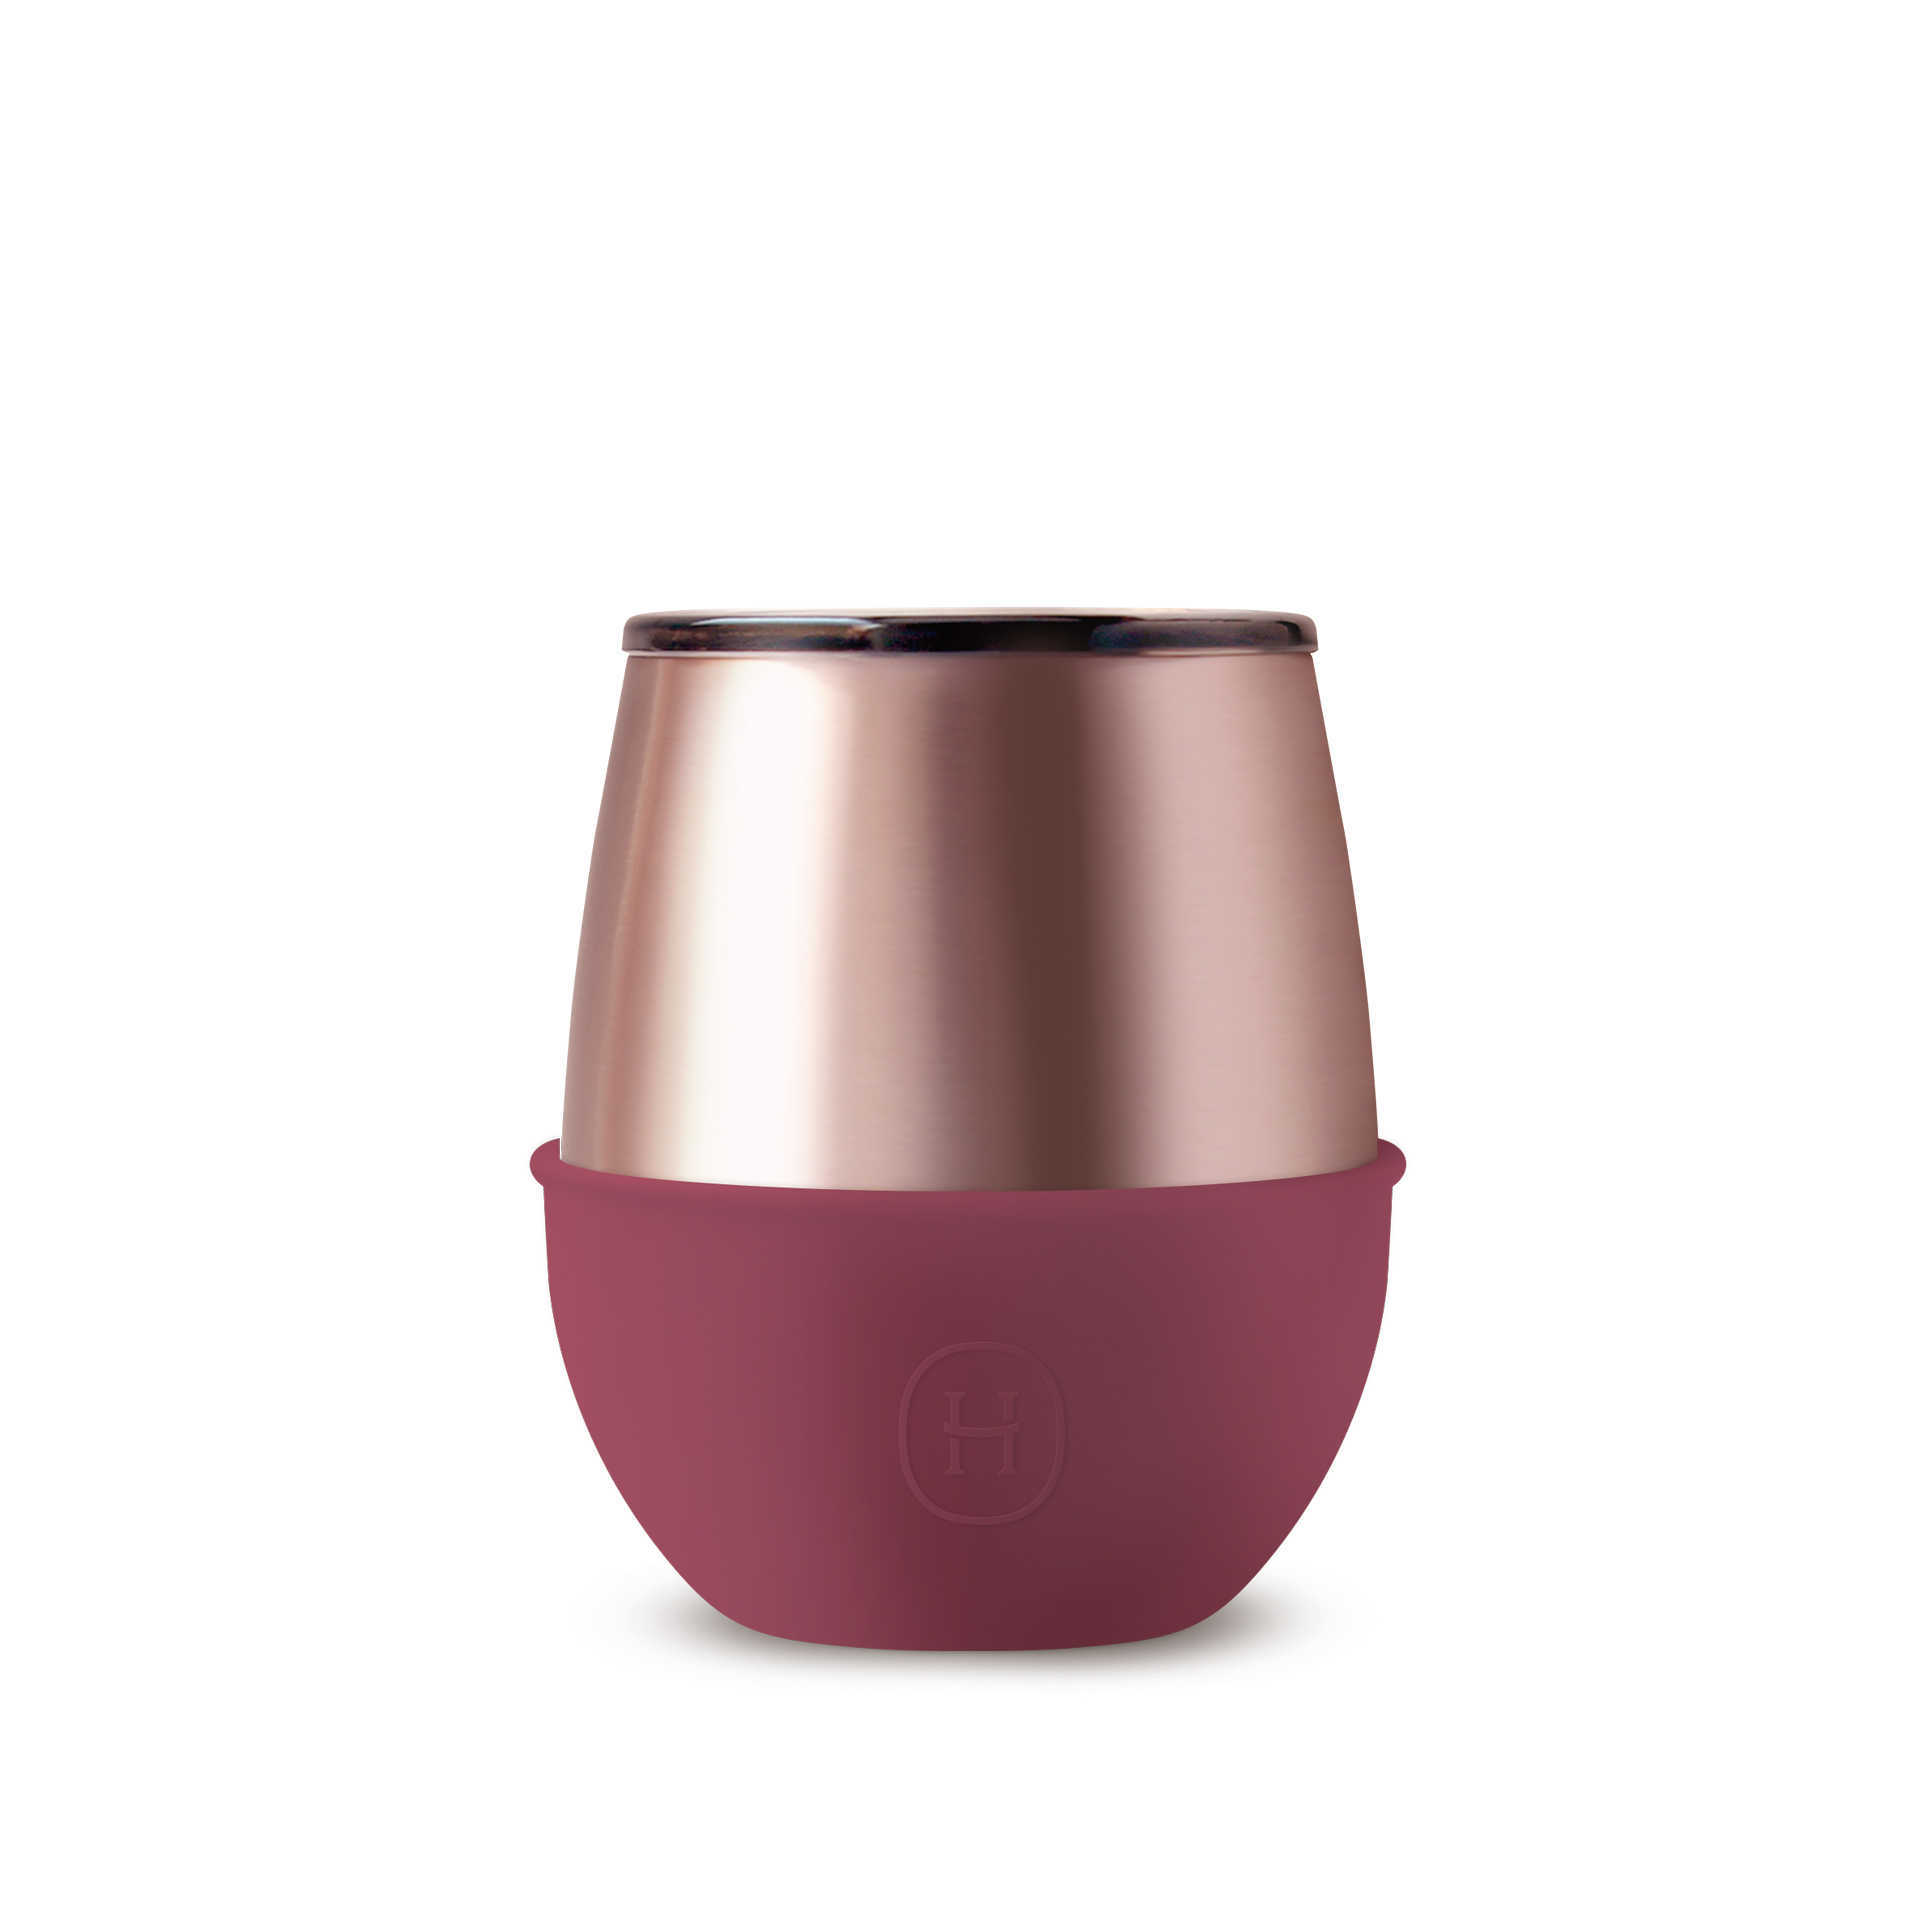 【HYDY】乾燥玫瑰/桑格莉亞-蜜粉金 蛋型杯 240ml